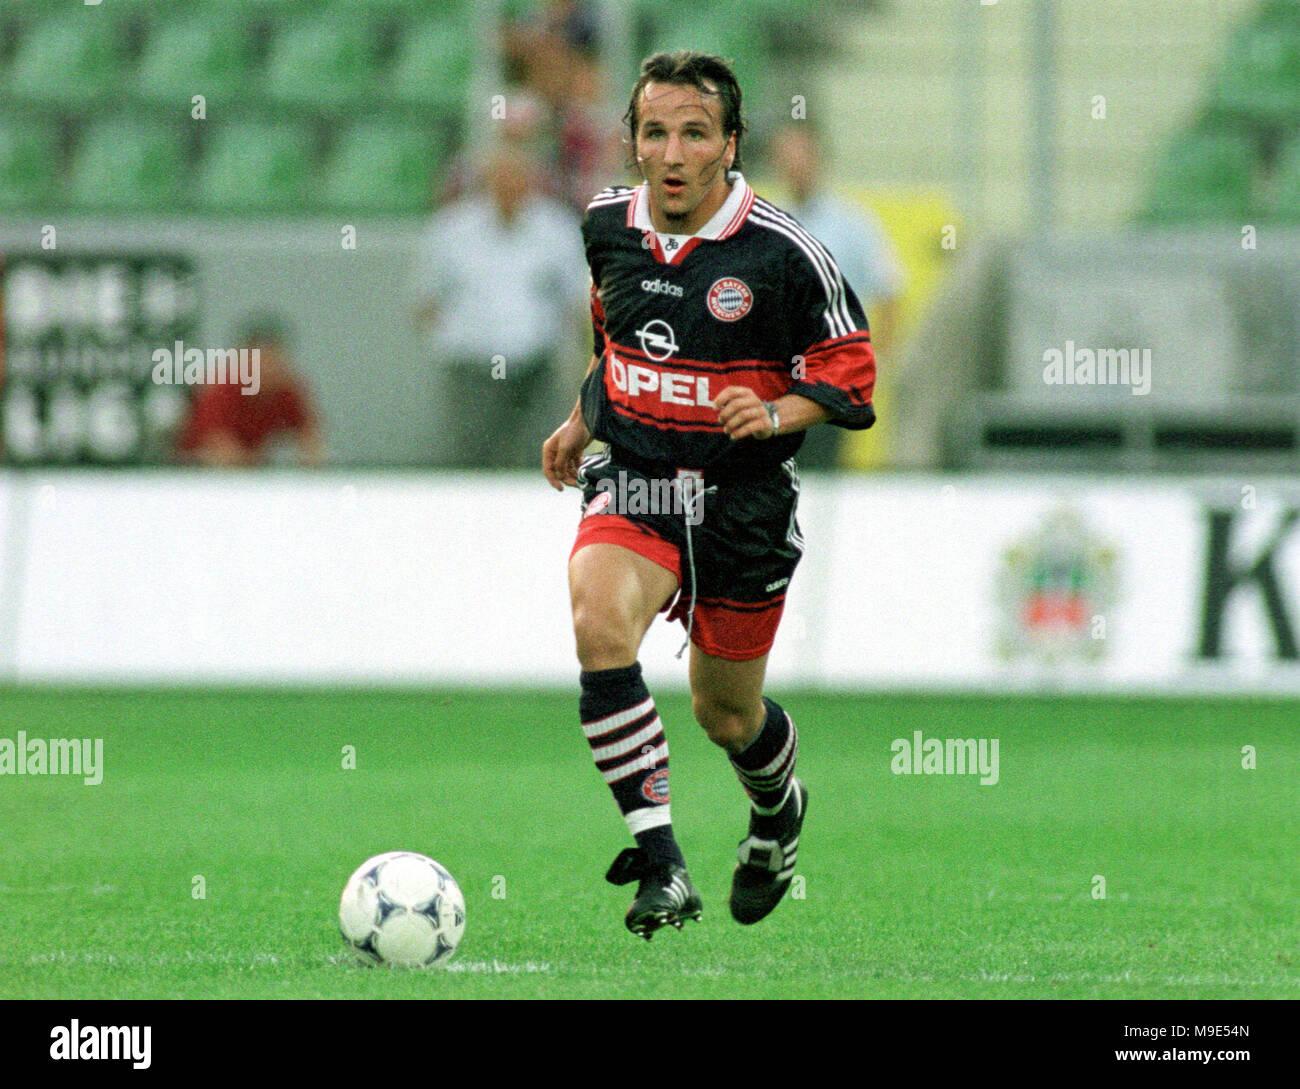 BayArena Leverkusen, Germany, 8.8.1998, German Liga-Cup Final, FC Bayern Munich vs VfB Stuttgart --- Jens JEREMIES  (Munich) - Stock Image